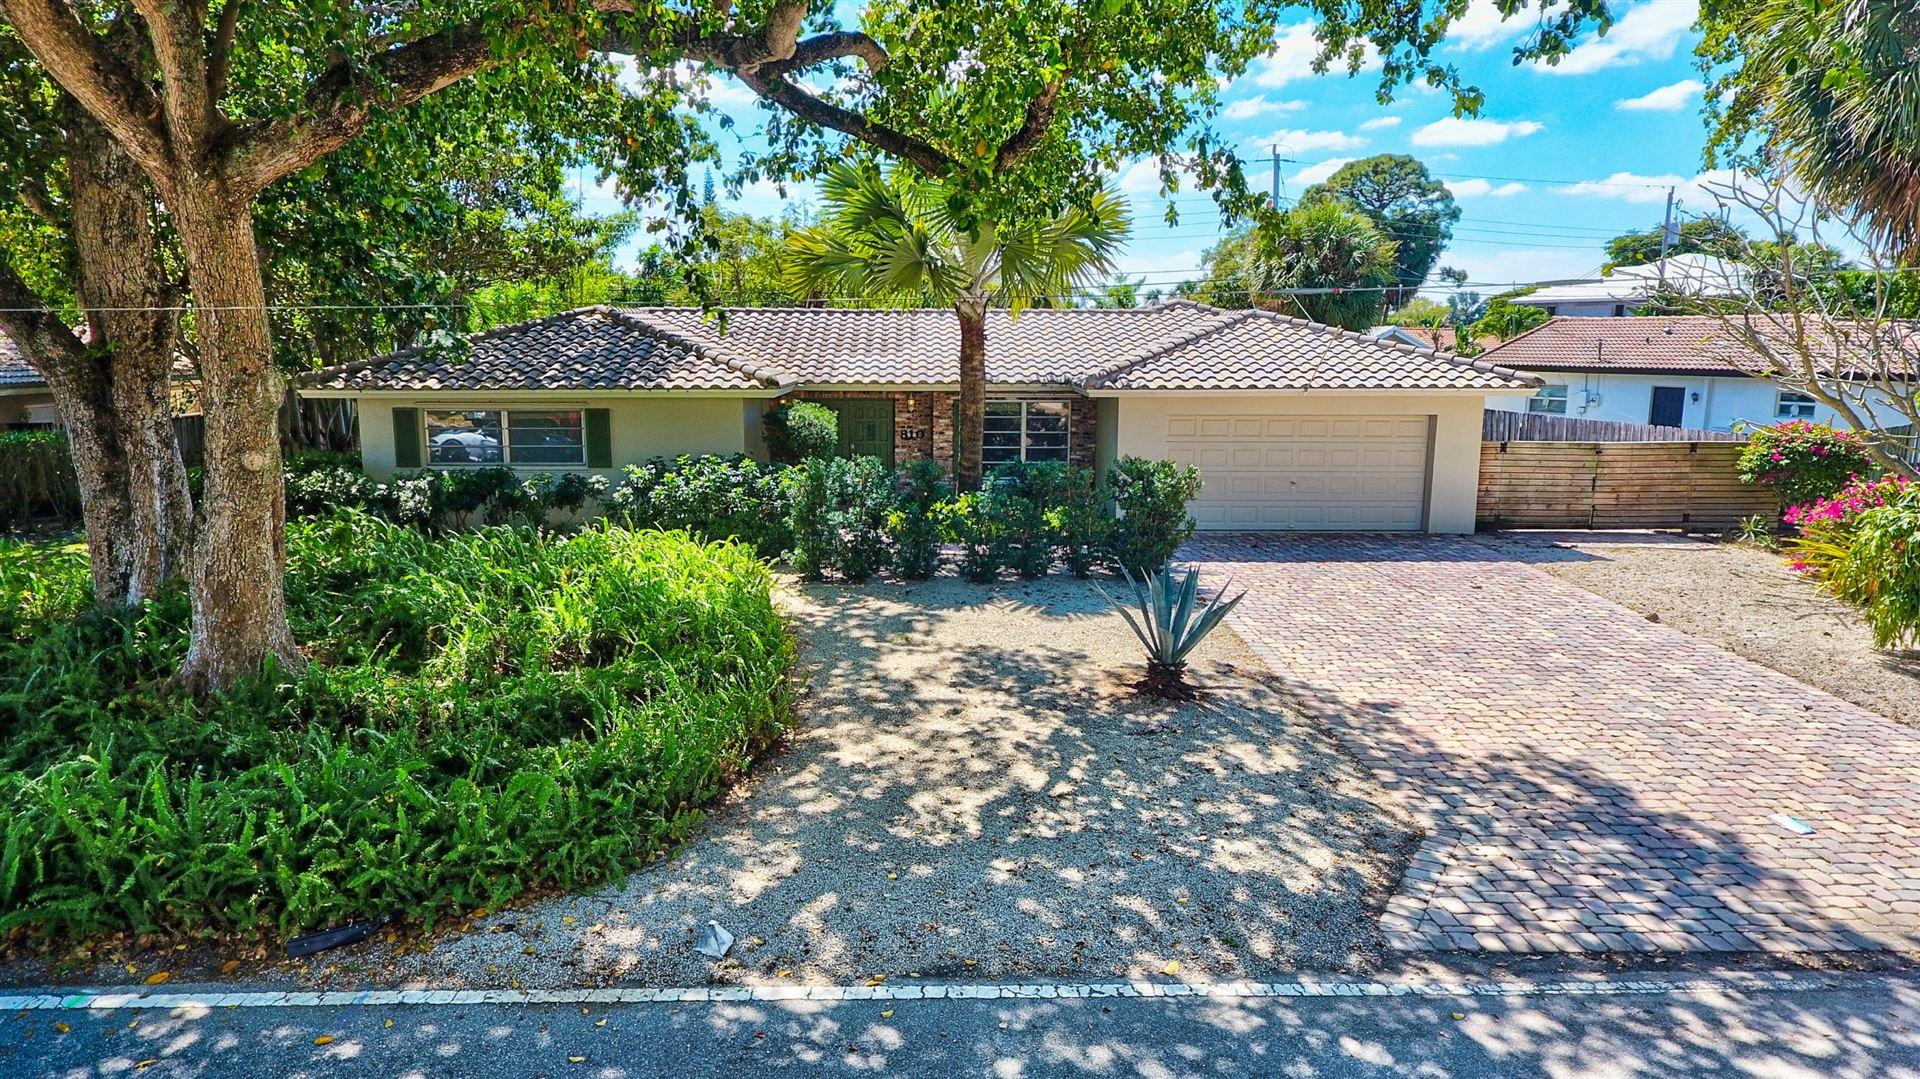 810 NW 7th Street, Boca Raton, FL 33486 - MLS#: RX-10697305